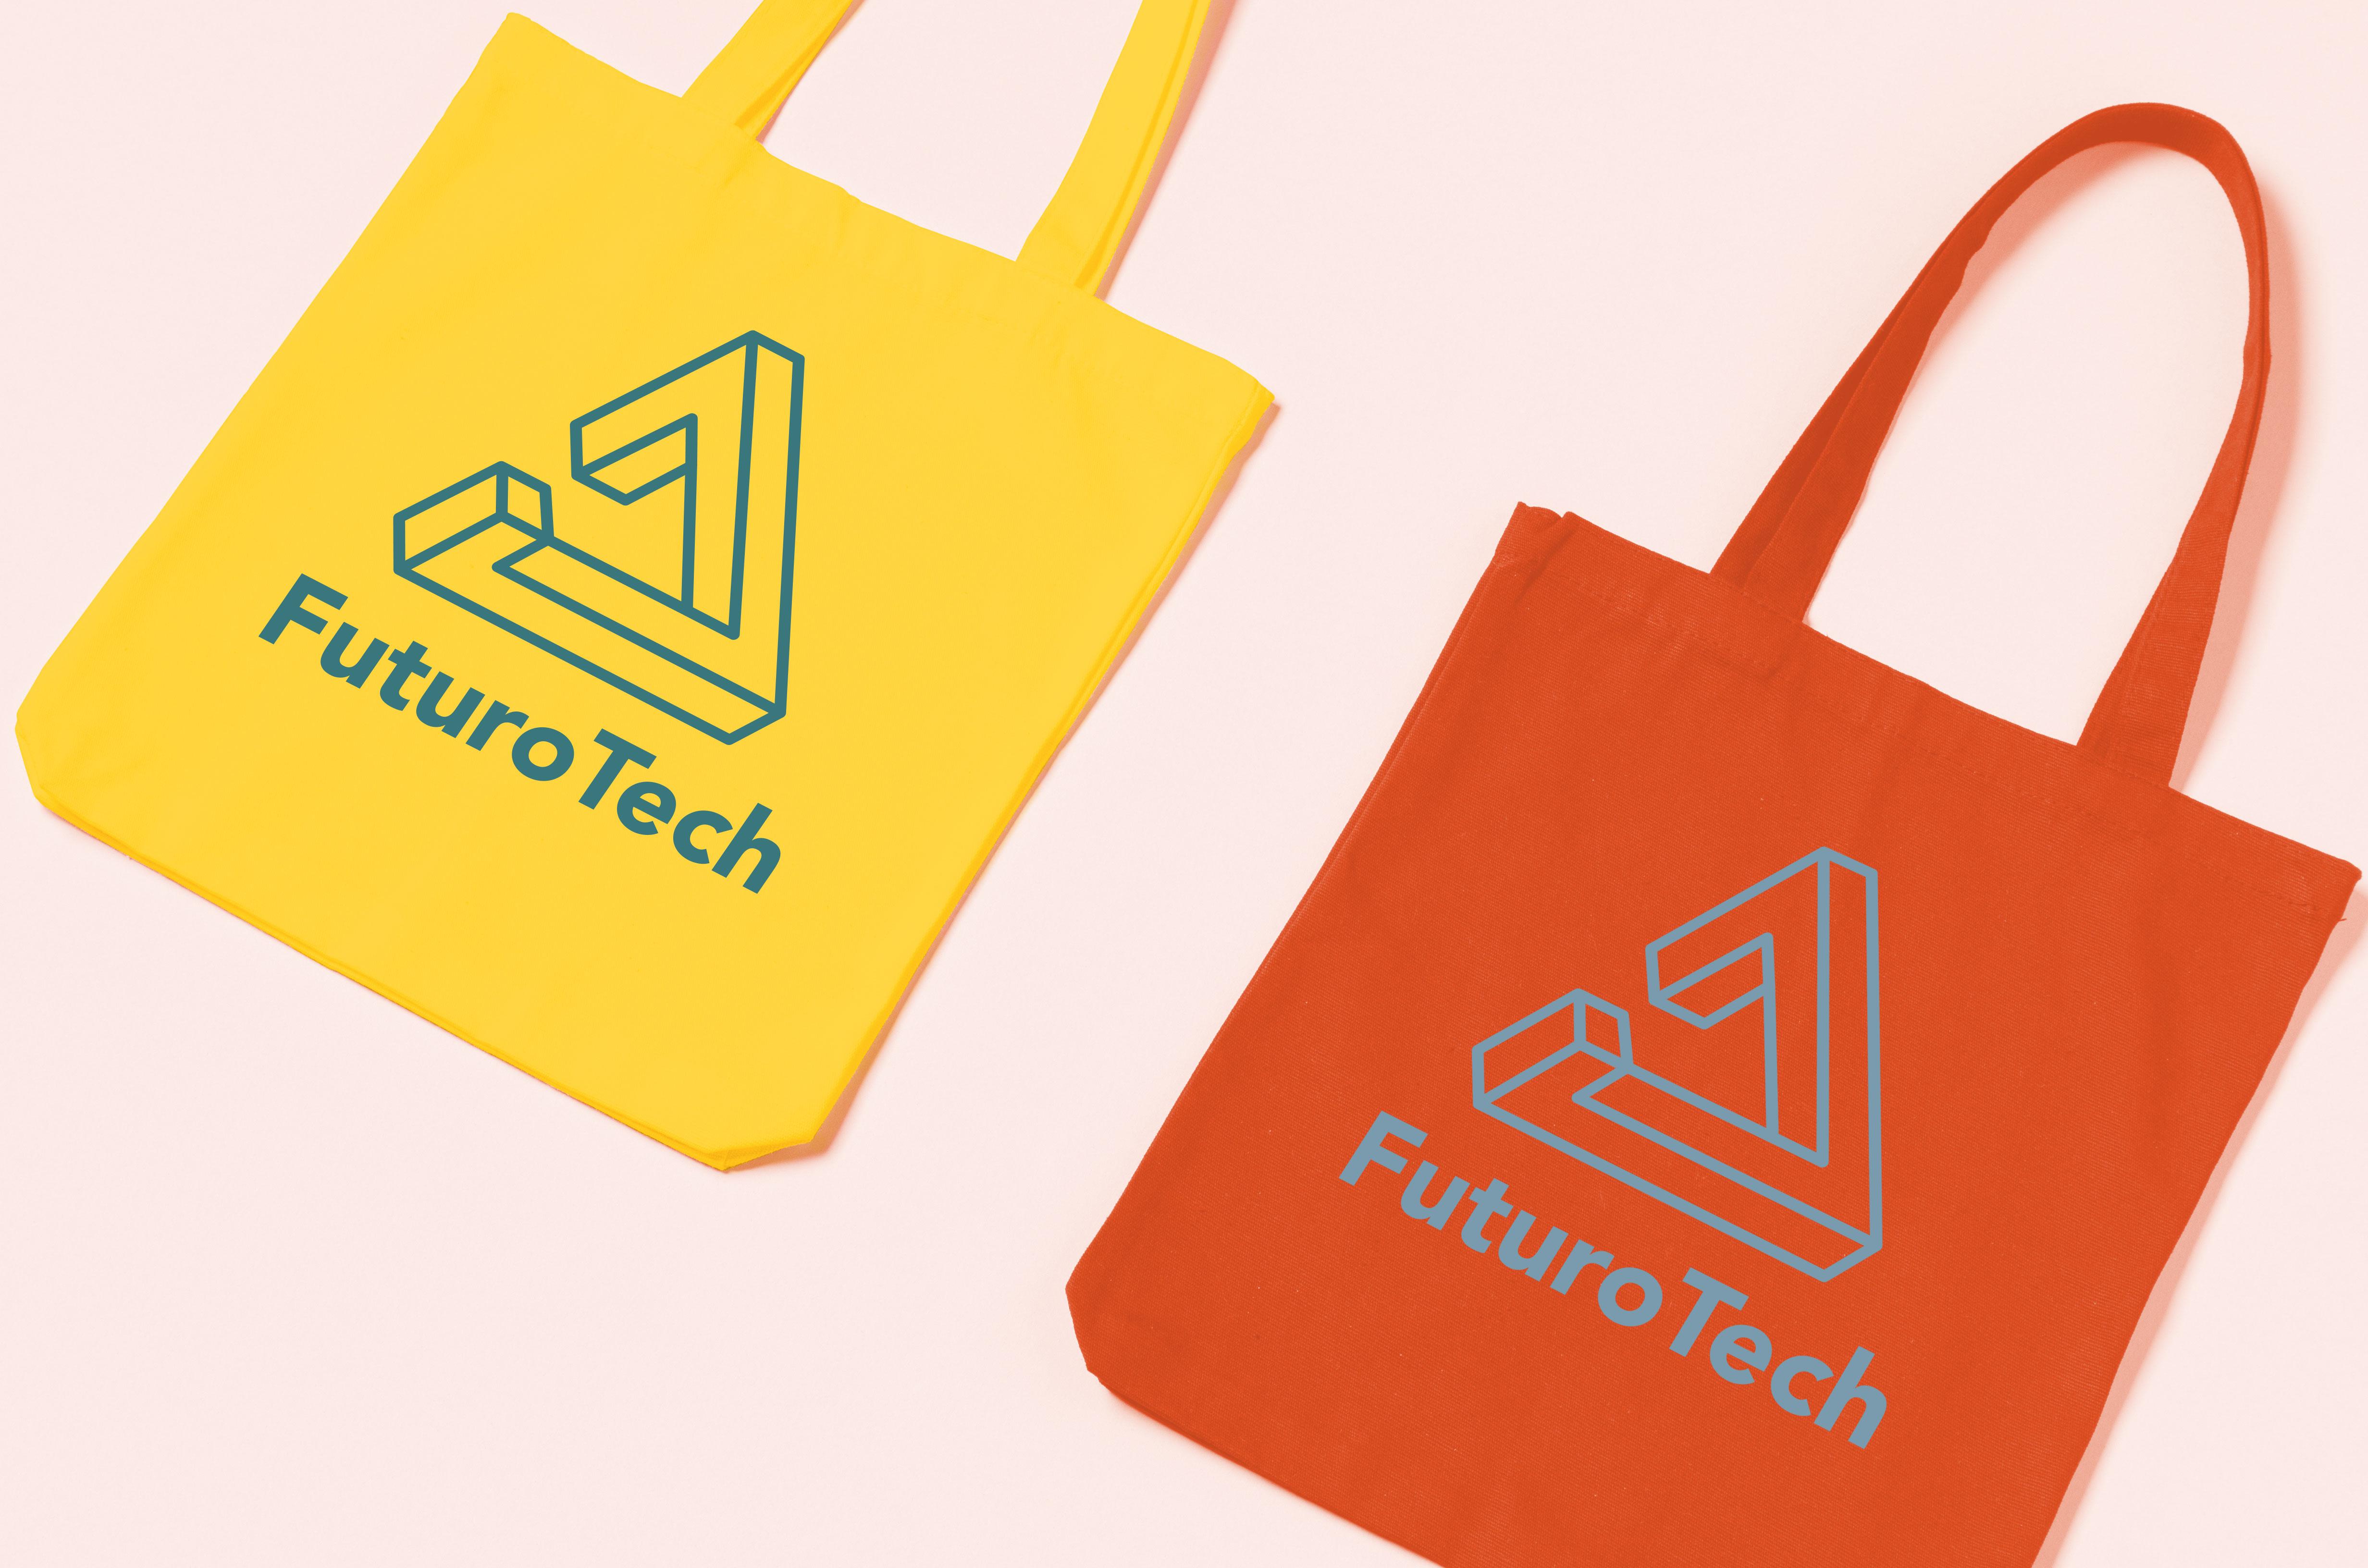 Futuro Tech